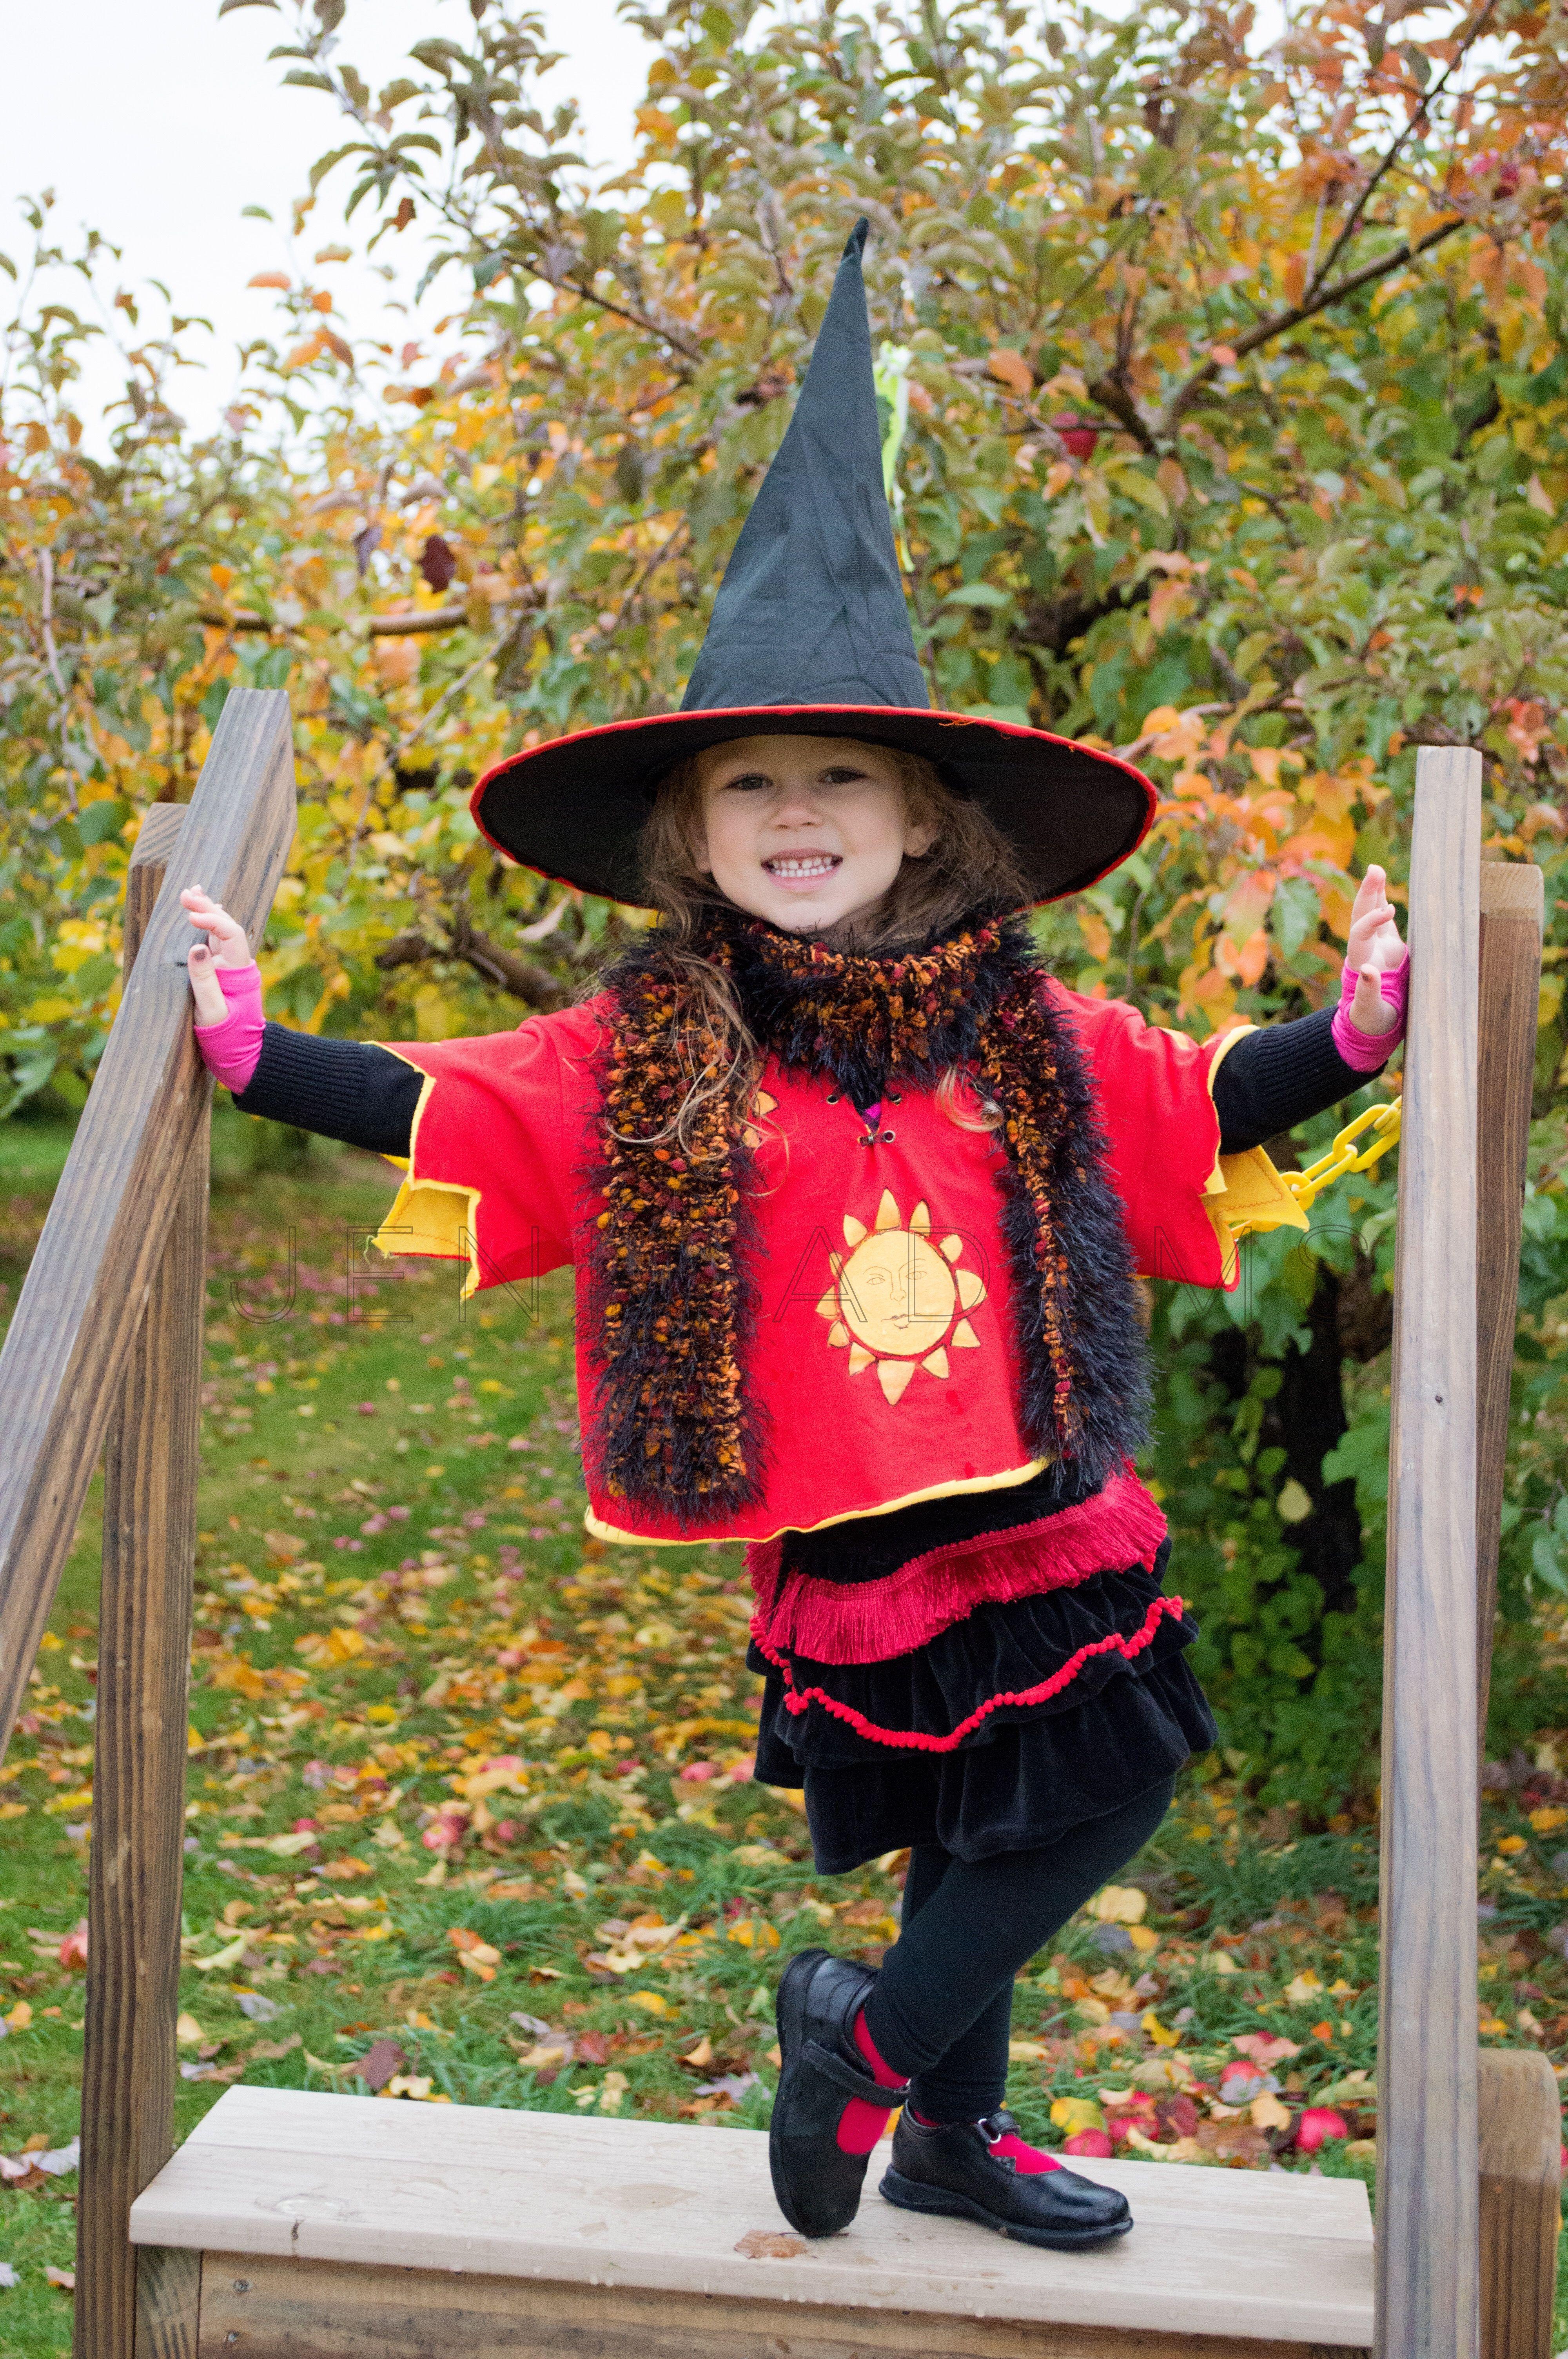 Dani Halloween Costume Hocus Pocus Cute Halloween Costumes Halloween Costumes Pictures Halloween Party Kids